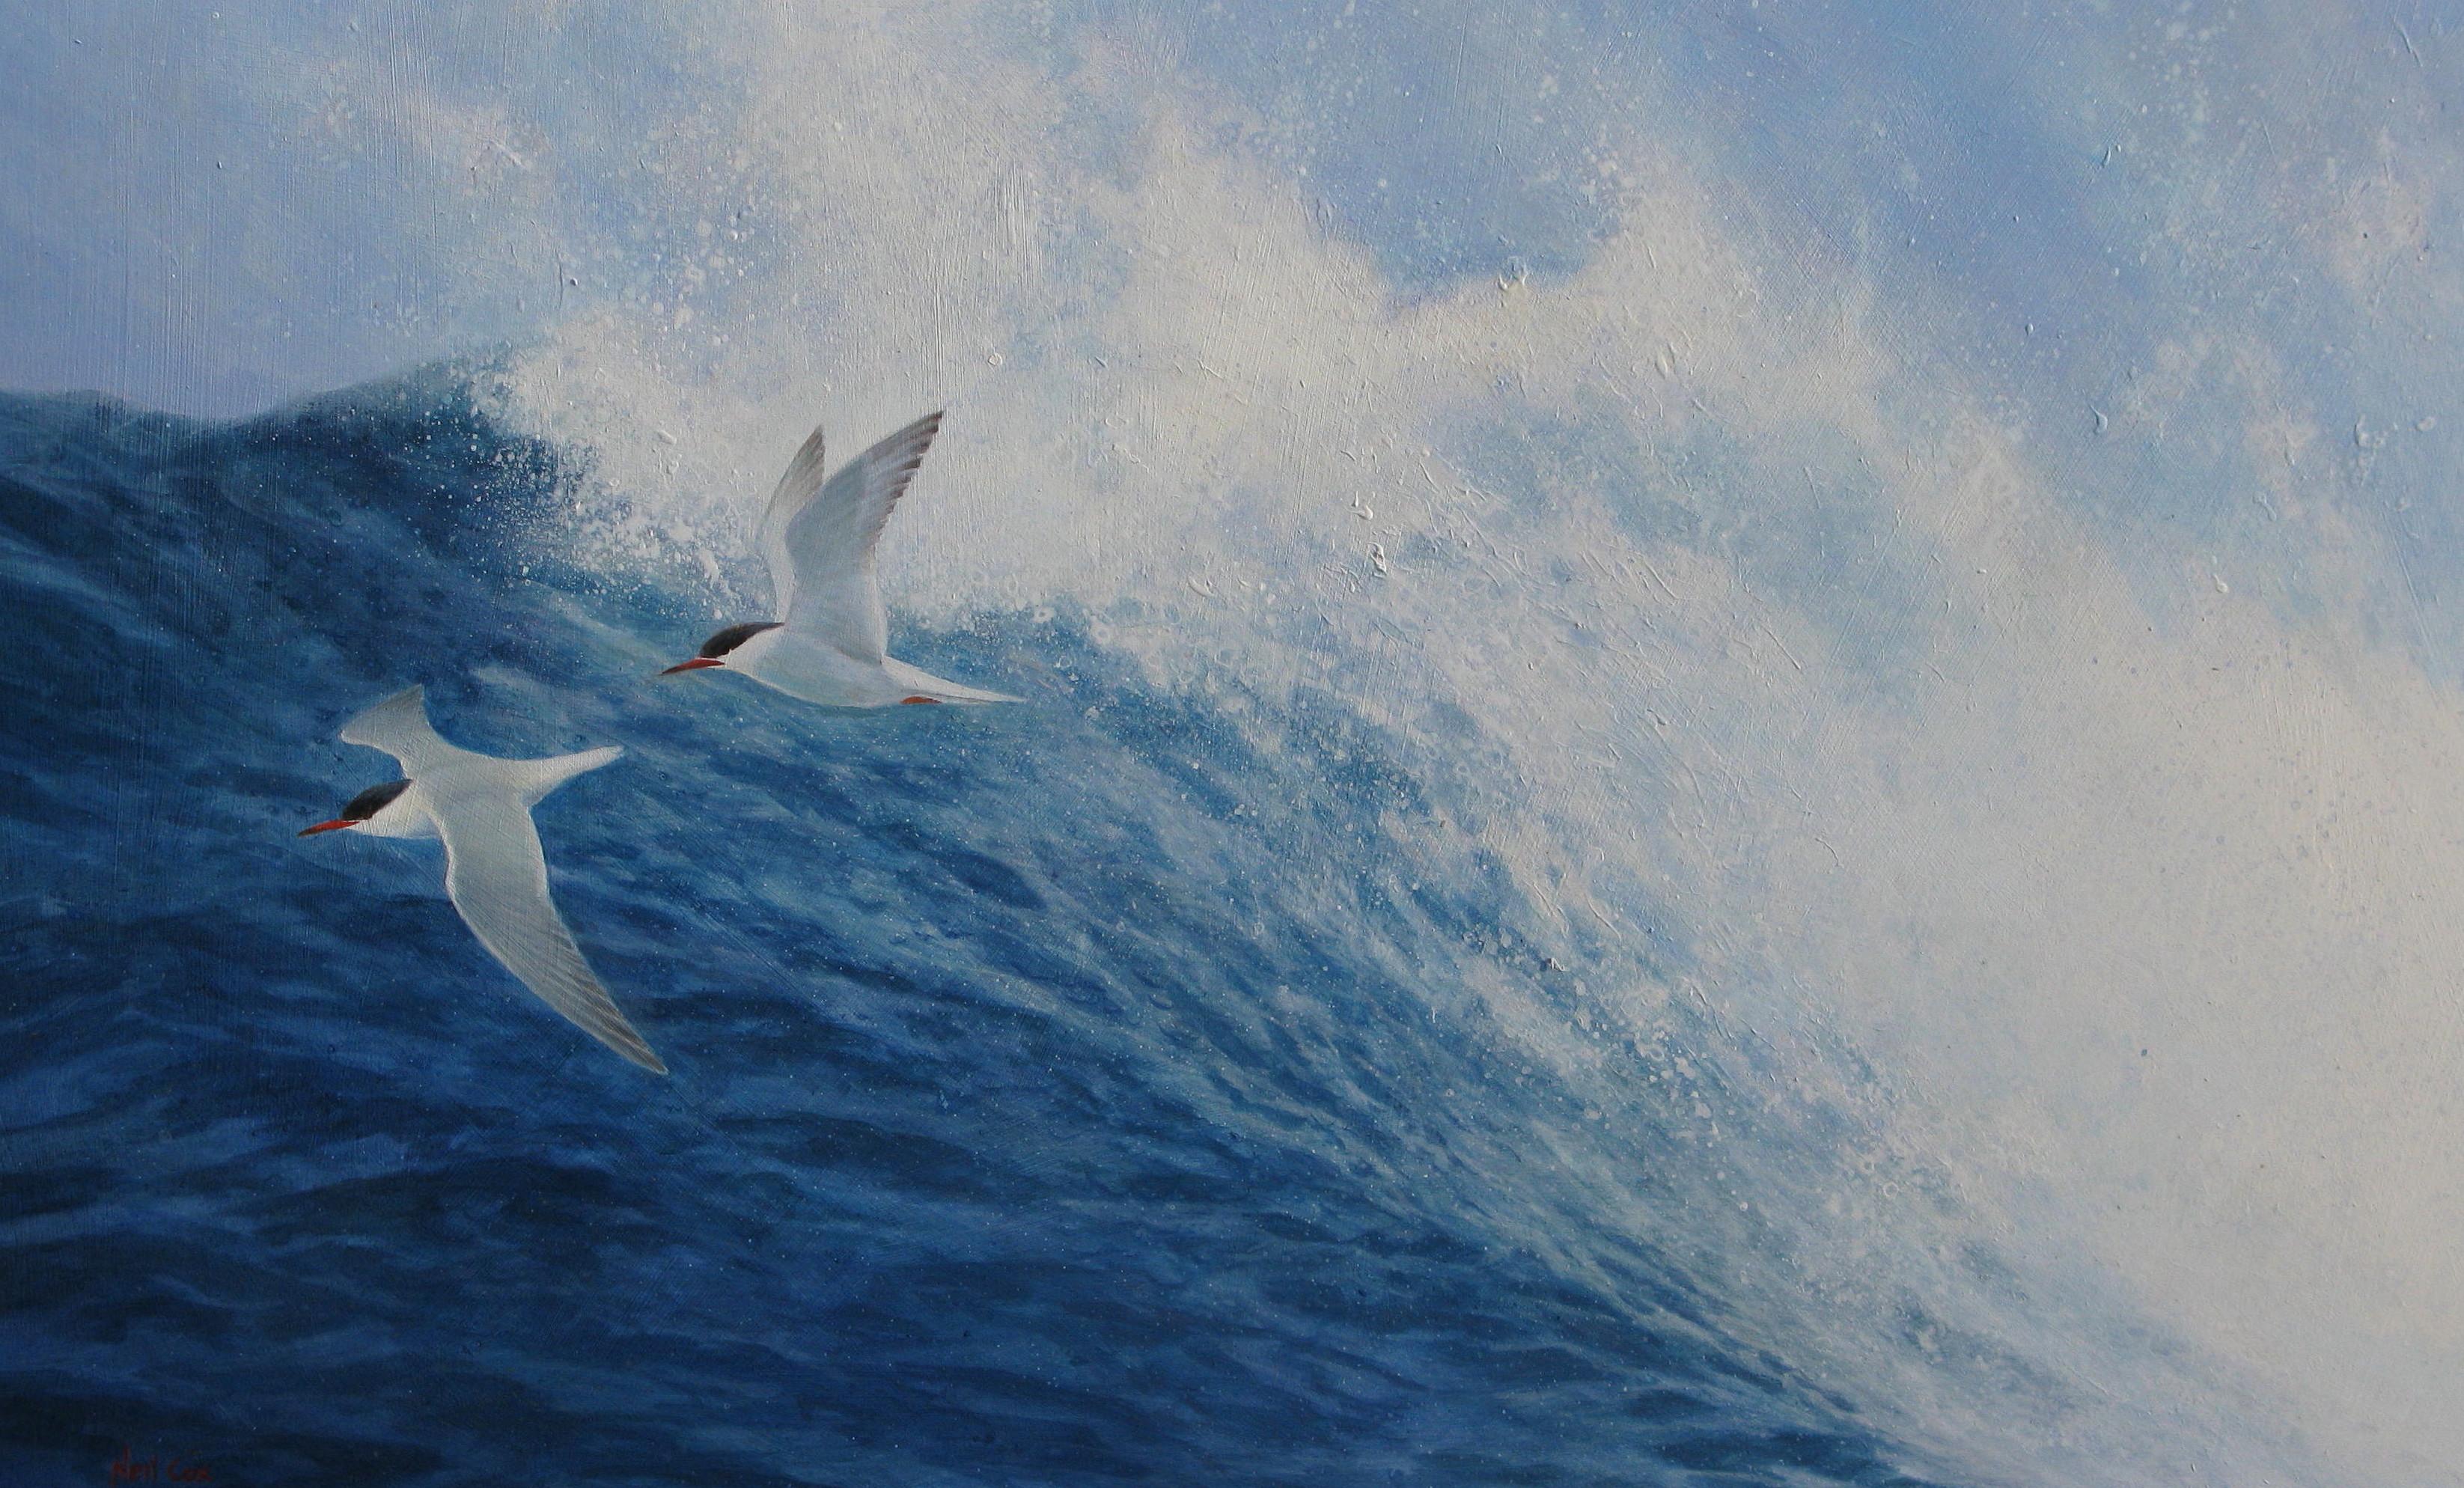 Breakers, Common Terns